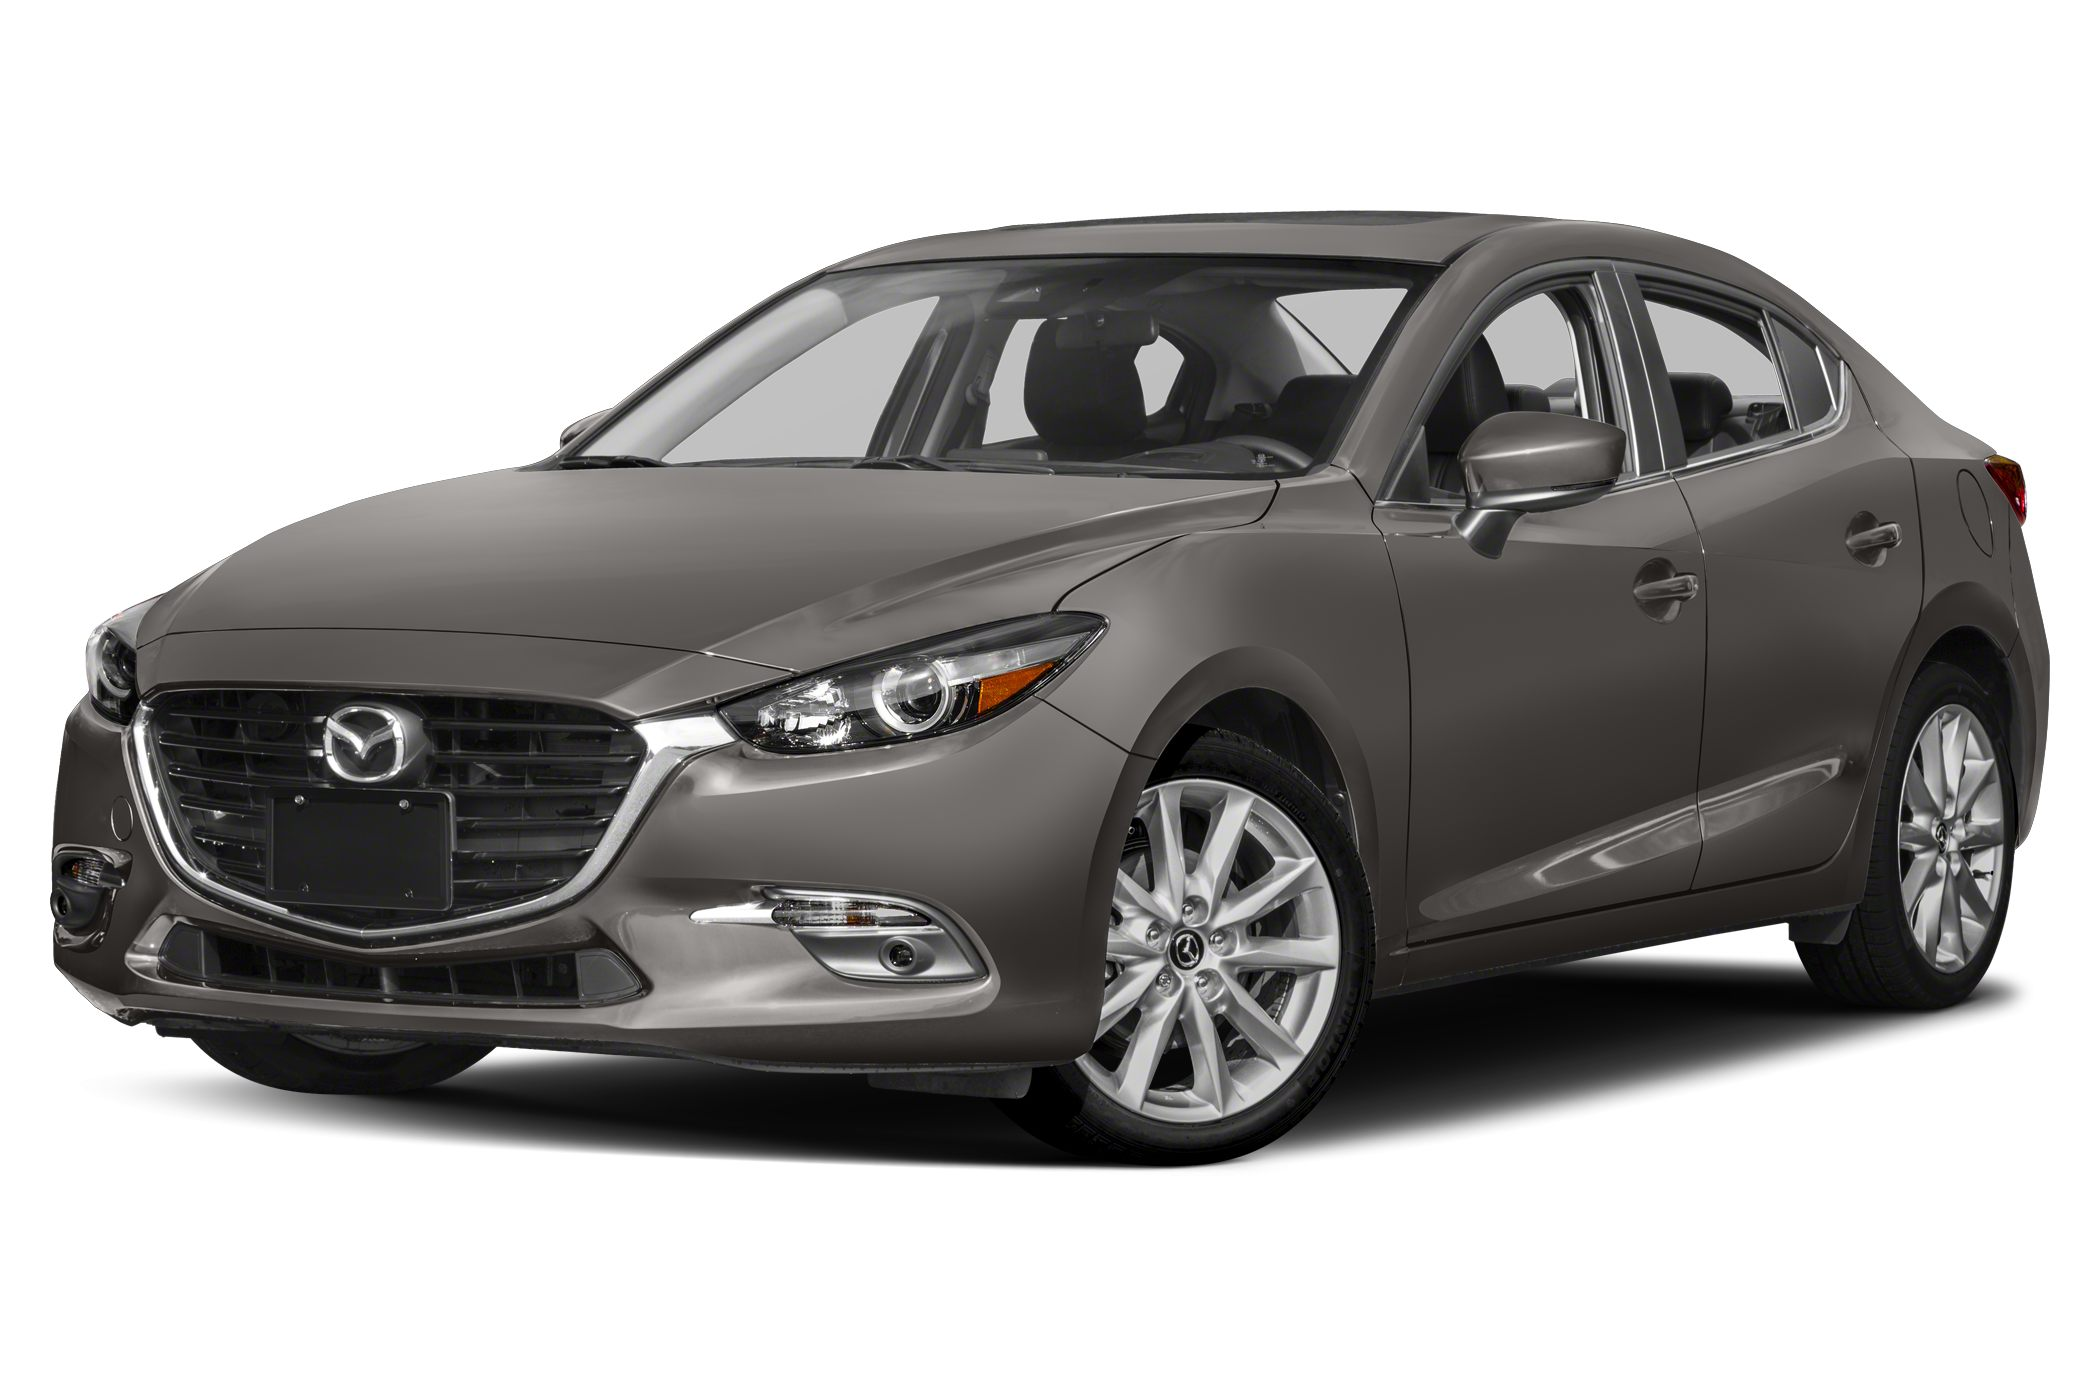 Grand Touring 4dr Sedan 2017 Mazda Mazda3 Photos